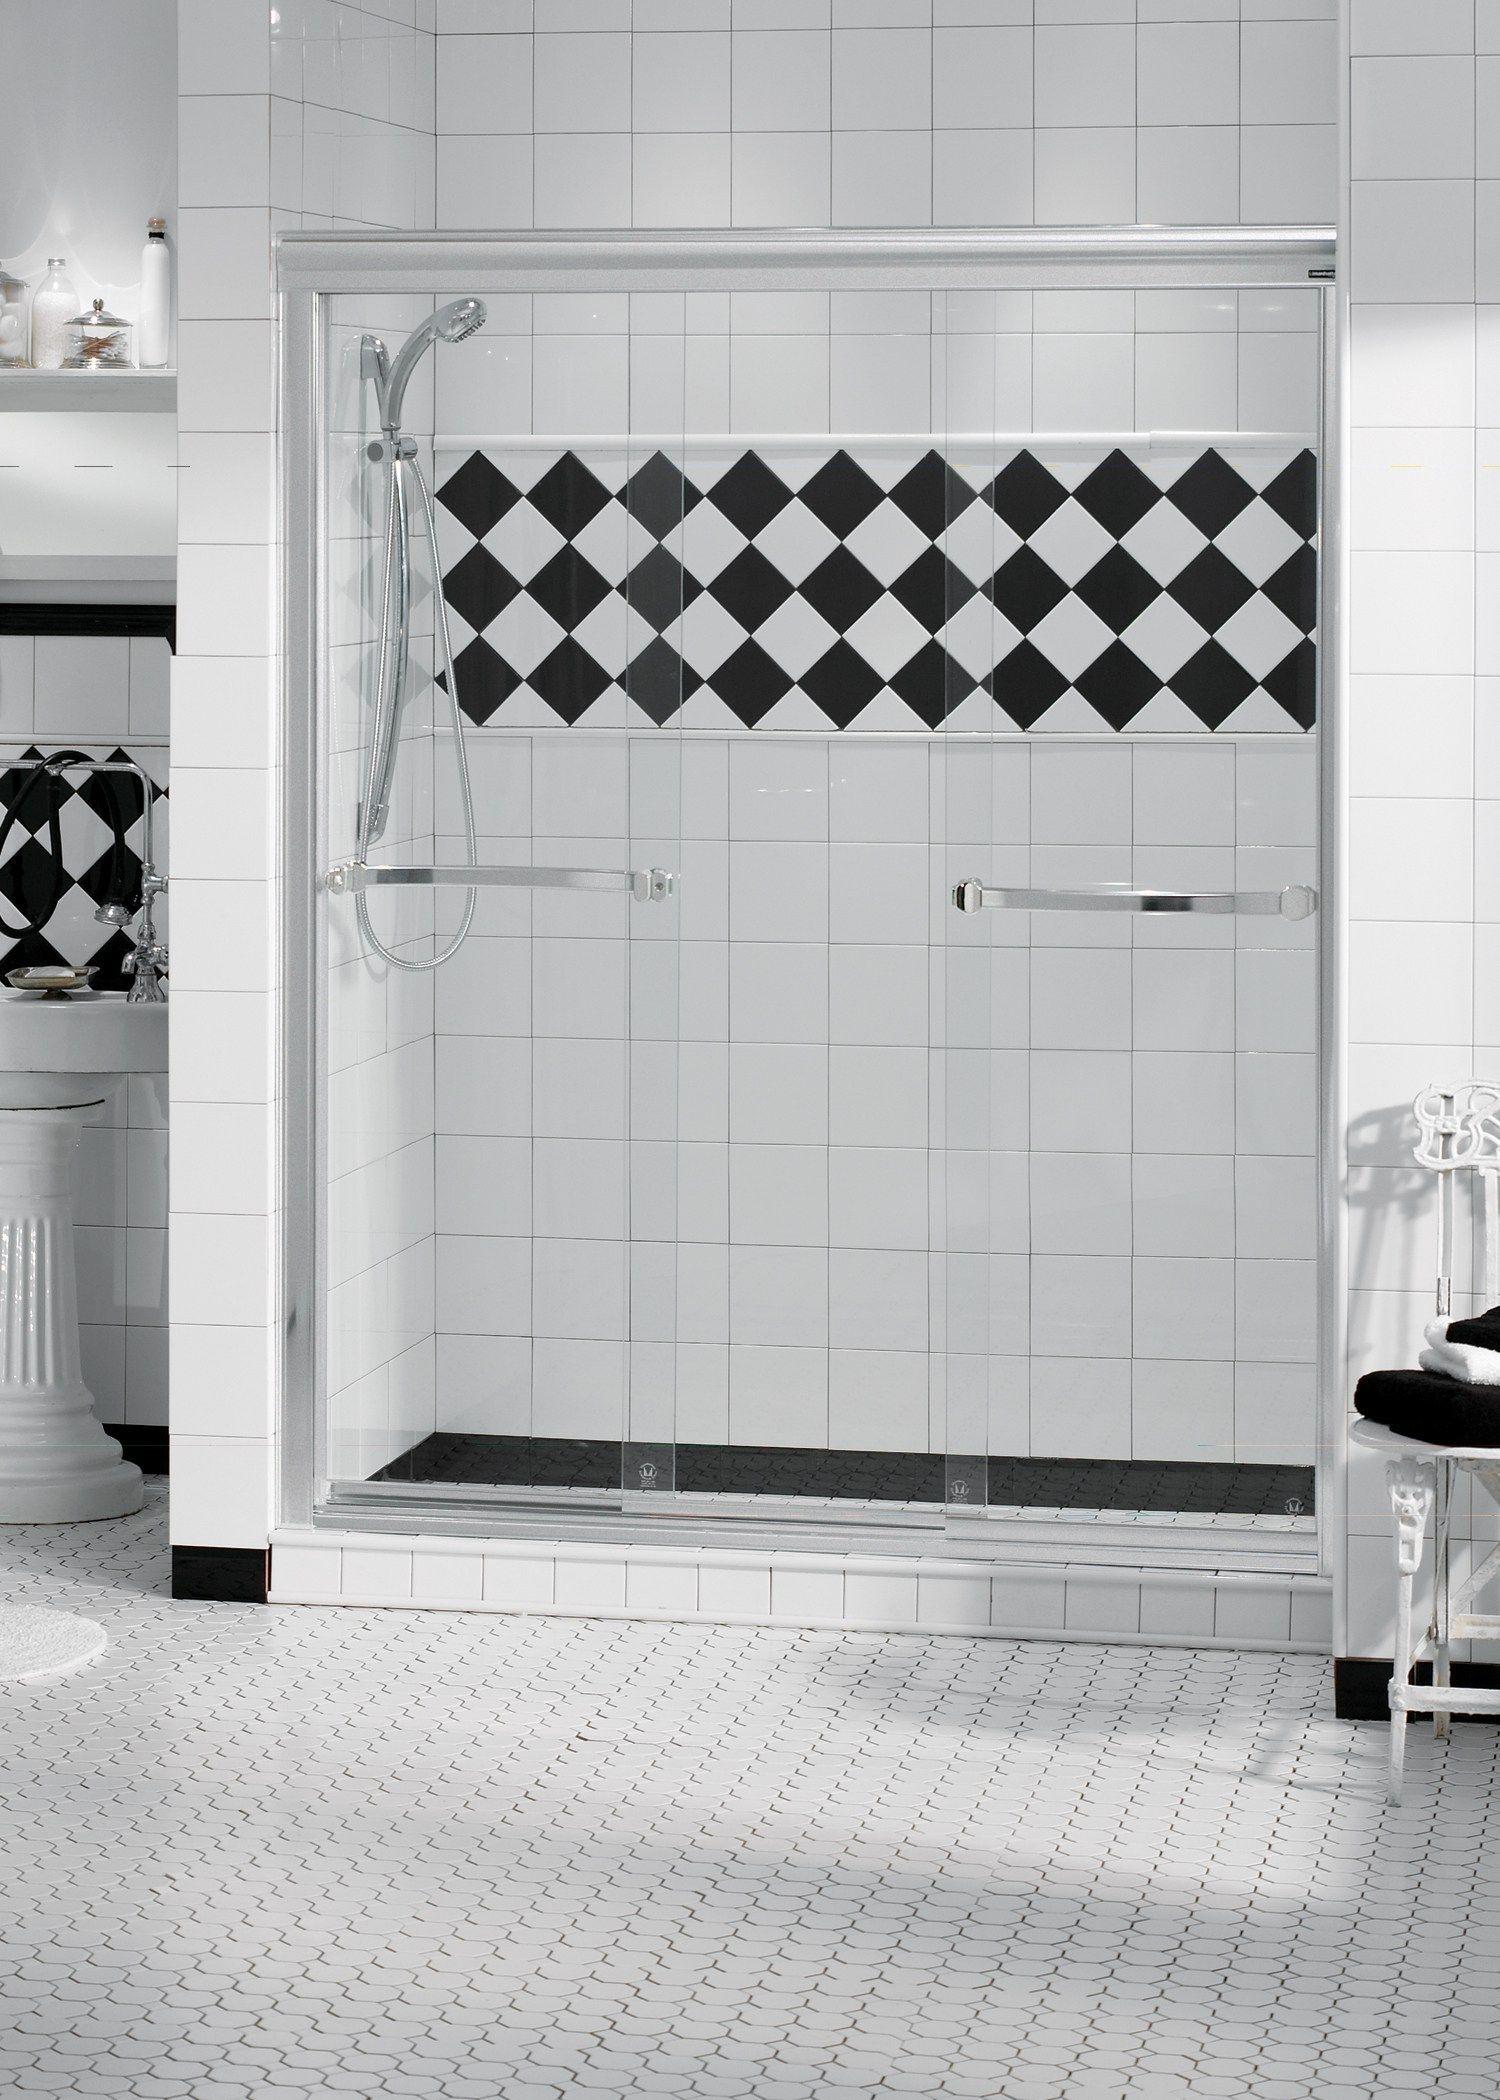 Pacific Bathrooms Is A Local Victoria, Bc, Bathroom Contractor Specializing